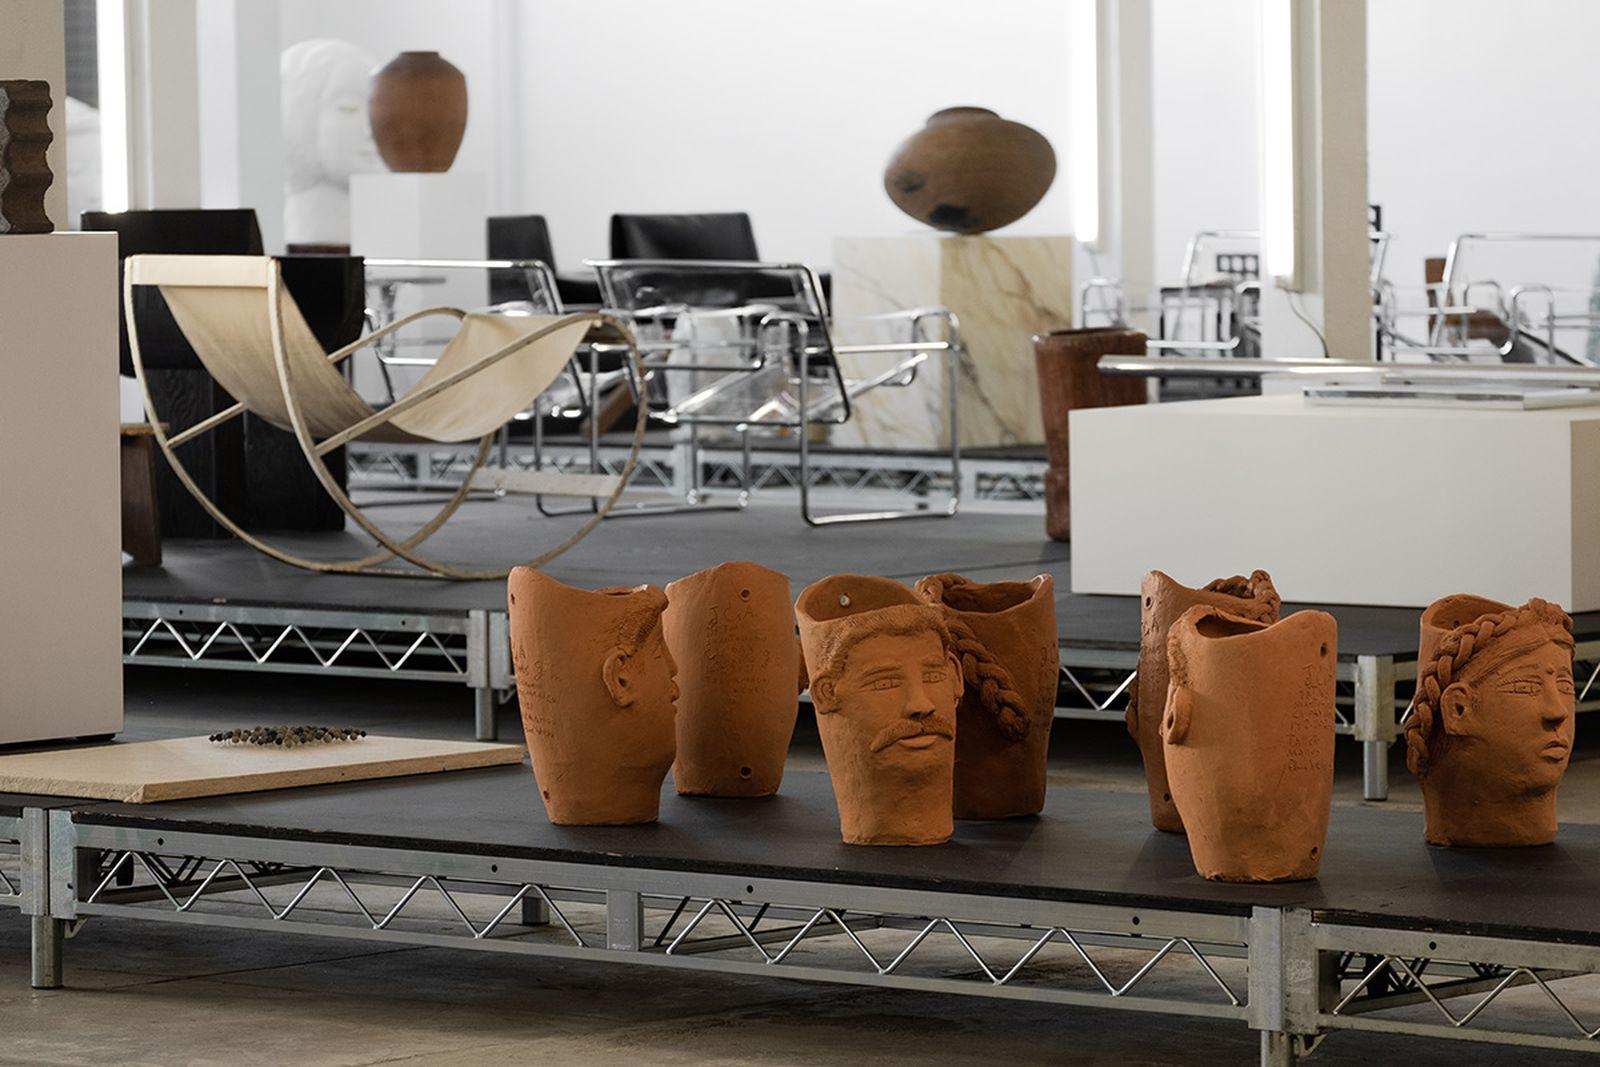 sized-los-angeles-exhibition-luka-sabbat-04